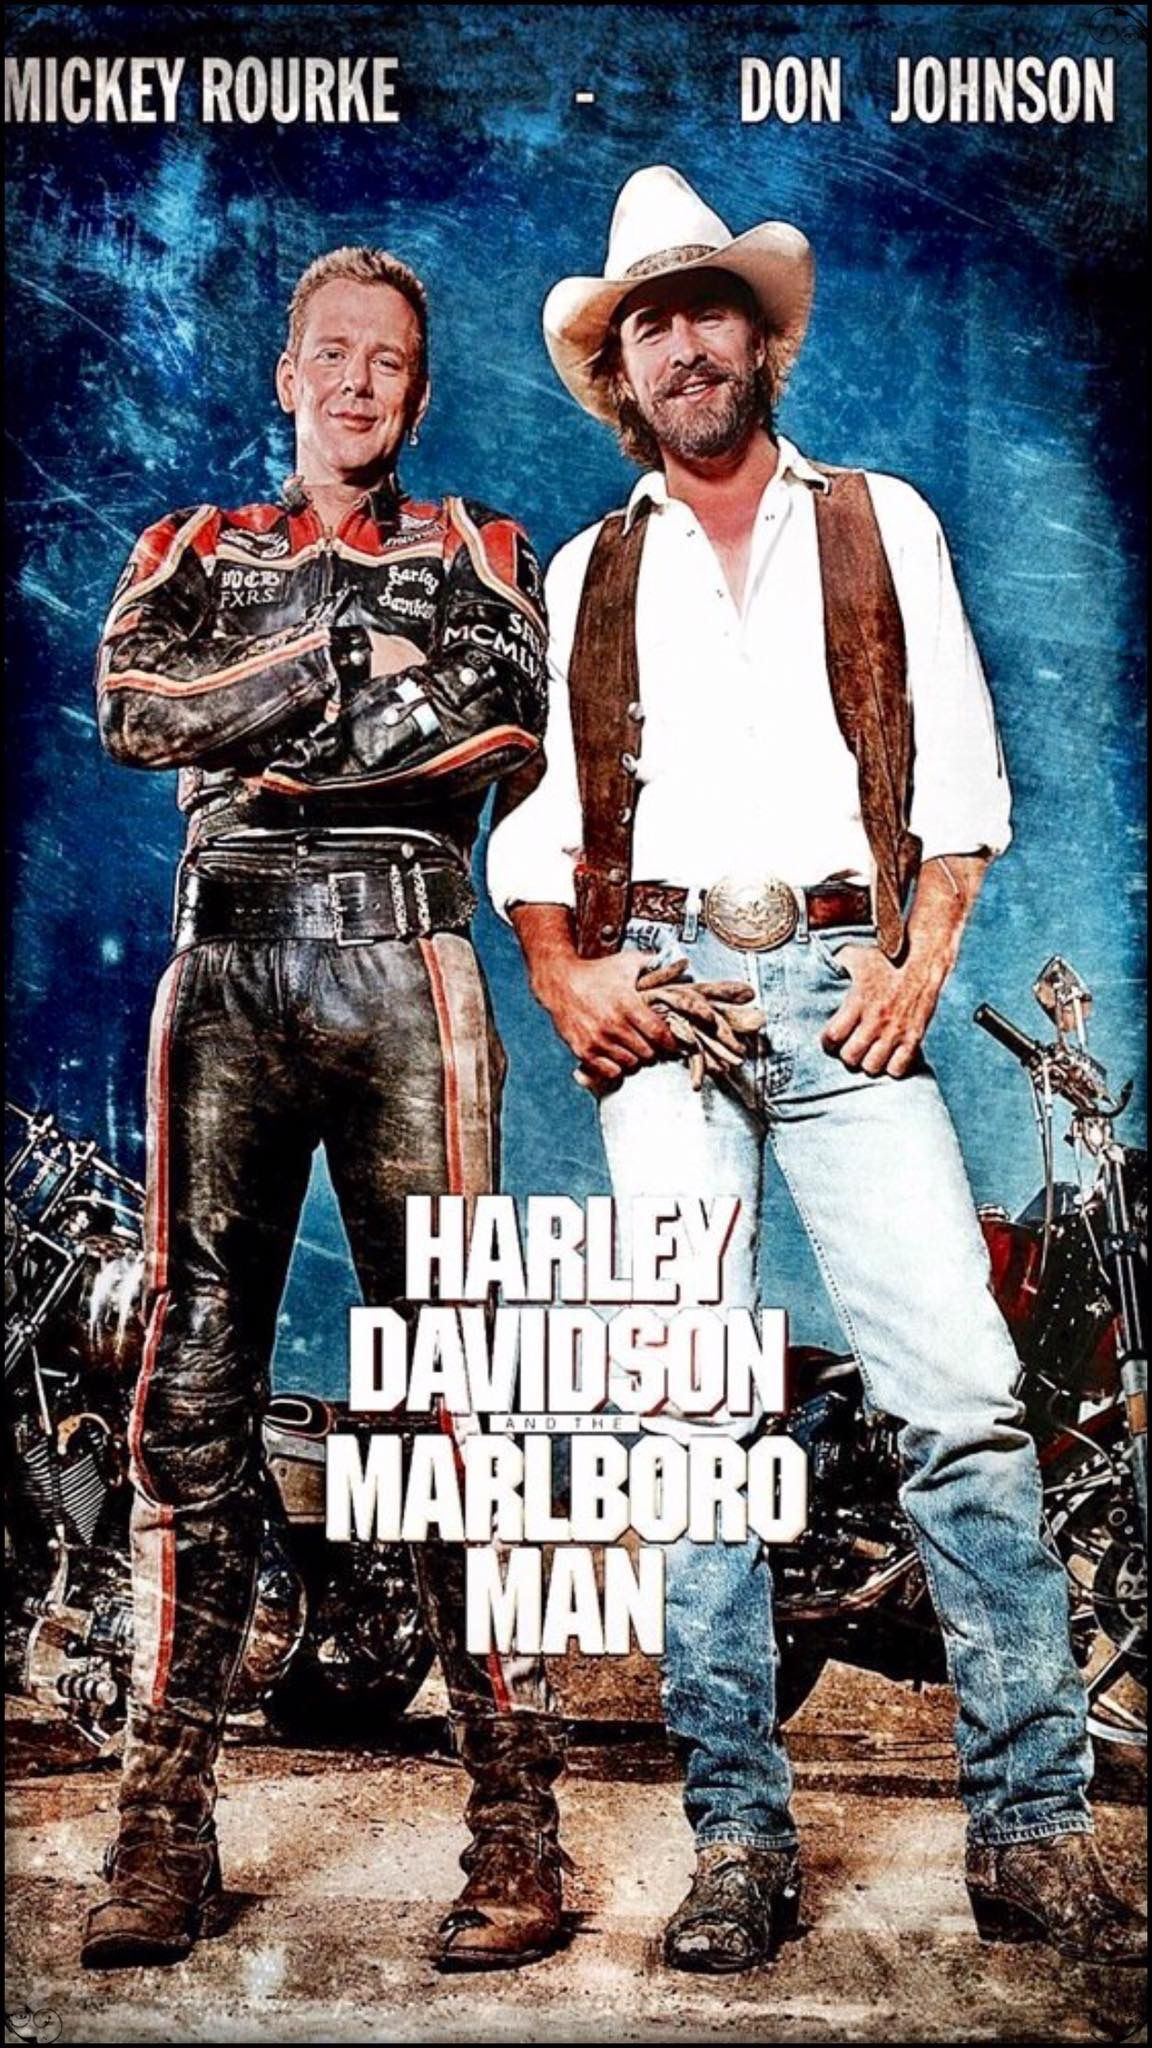 Pin By Debra Raney On Don Johnson Marlboro Man Biker Movies Don Johnson